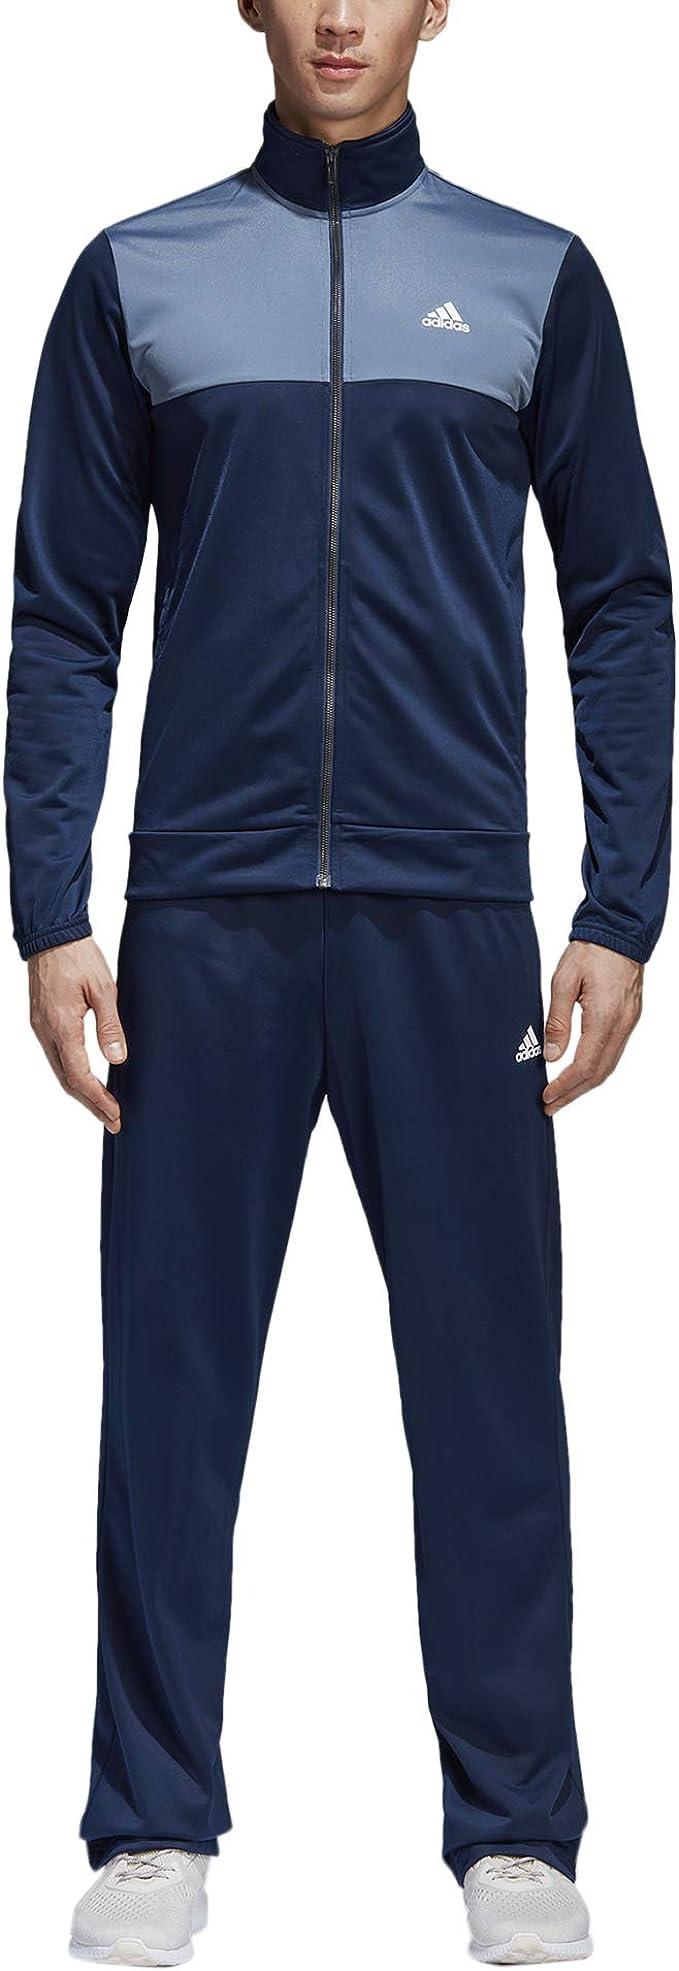 adidas Back2basics TS Chándal, Hombre: Amazon.es: Ropa y ...